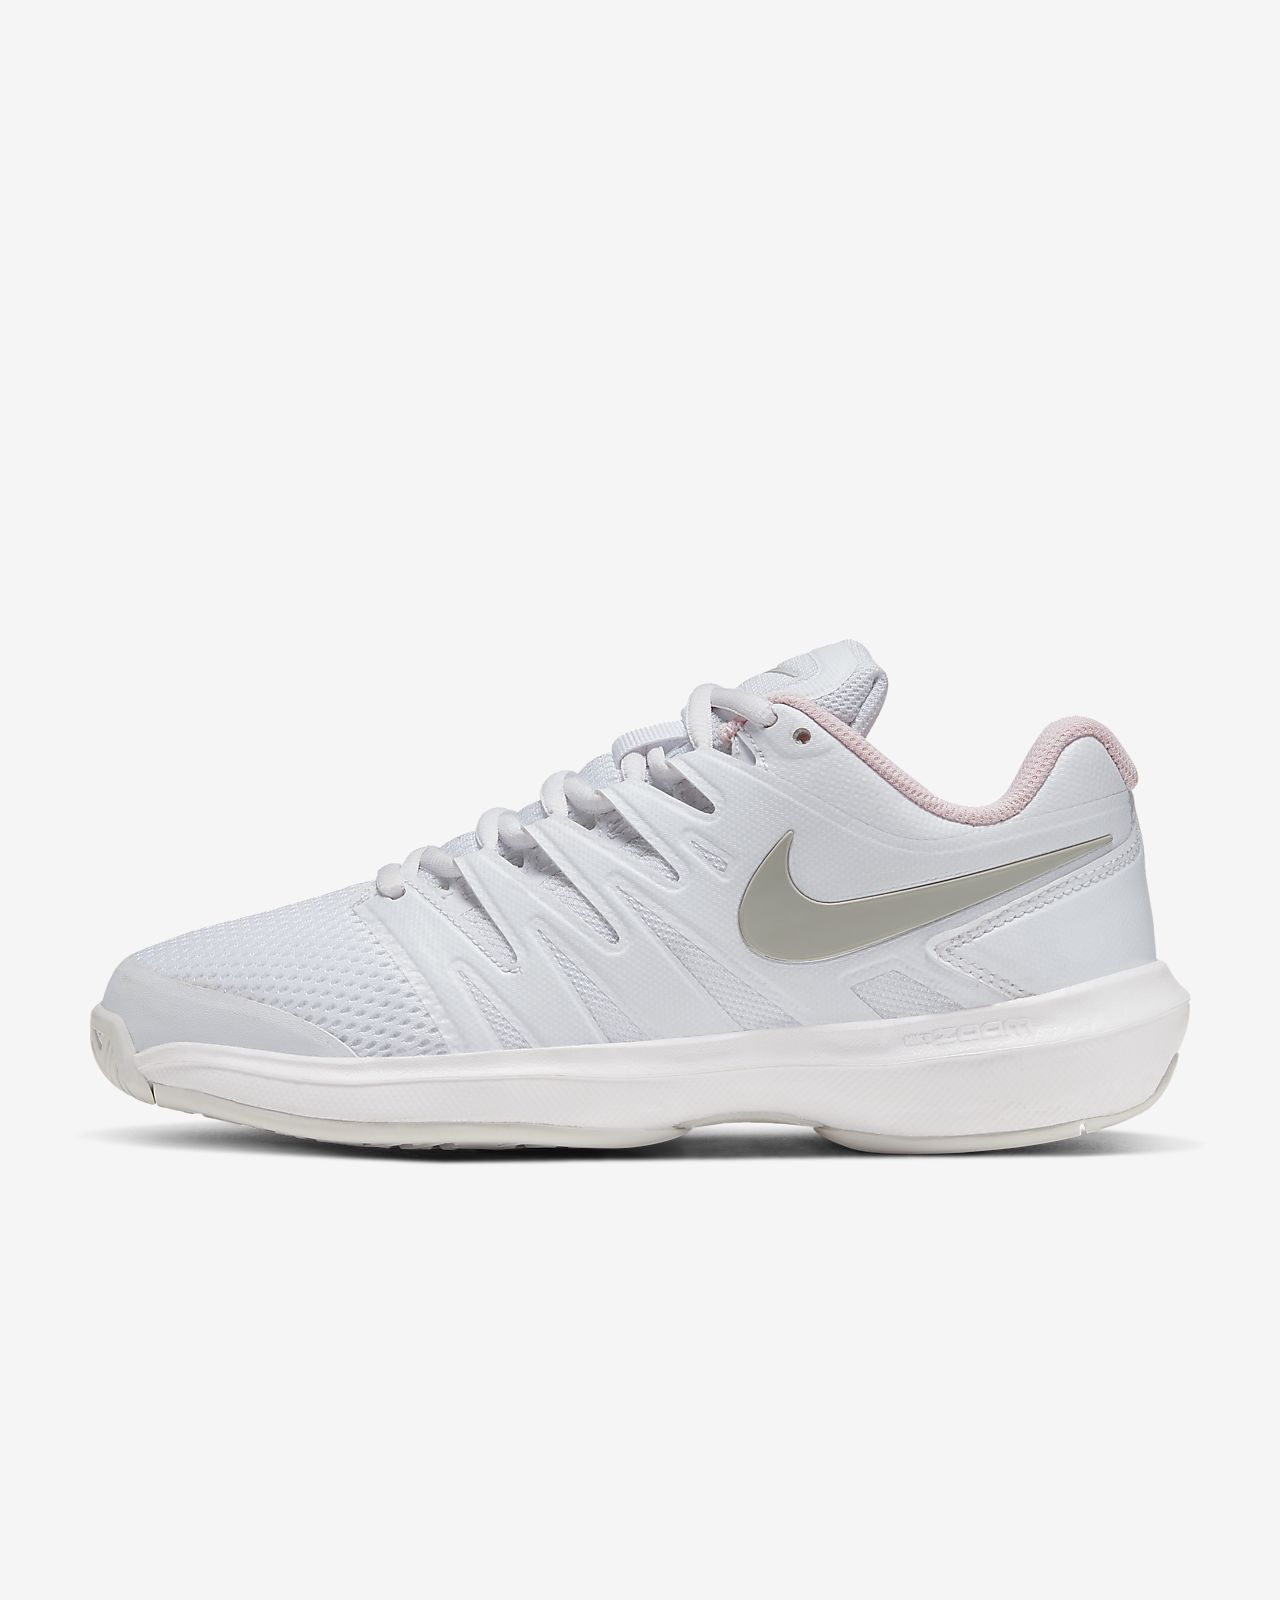 NikeCourt Air Zoom Prestige tennissko til dame